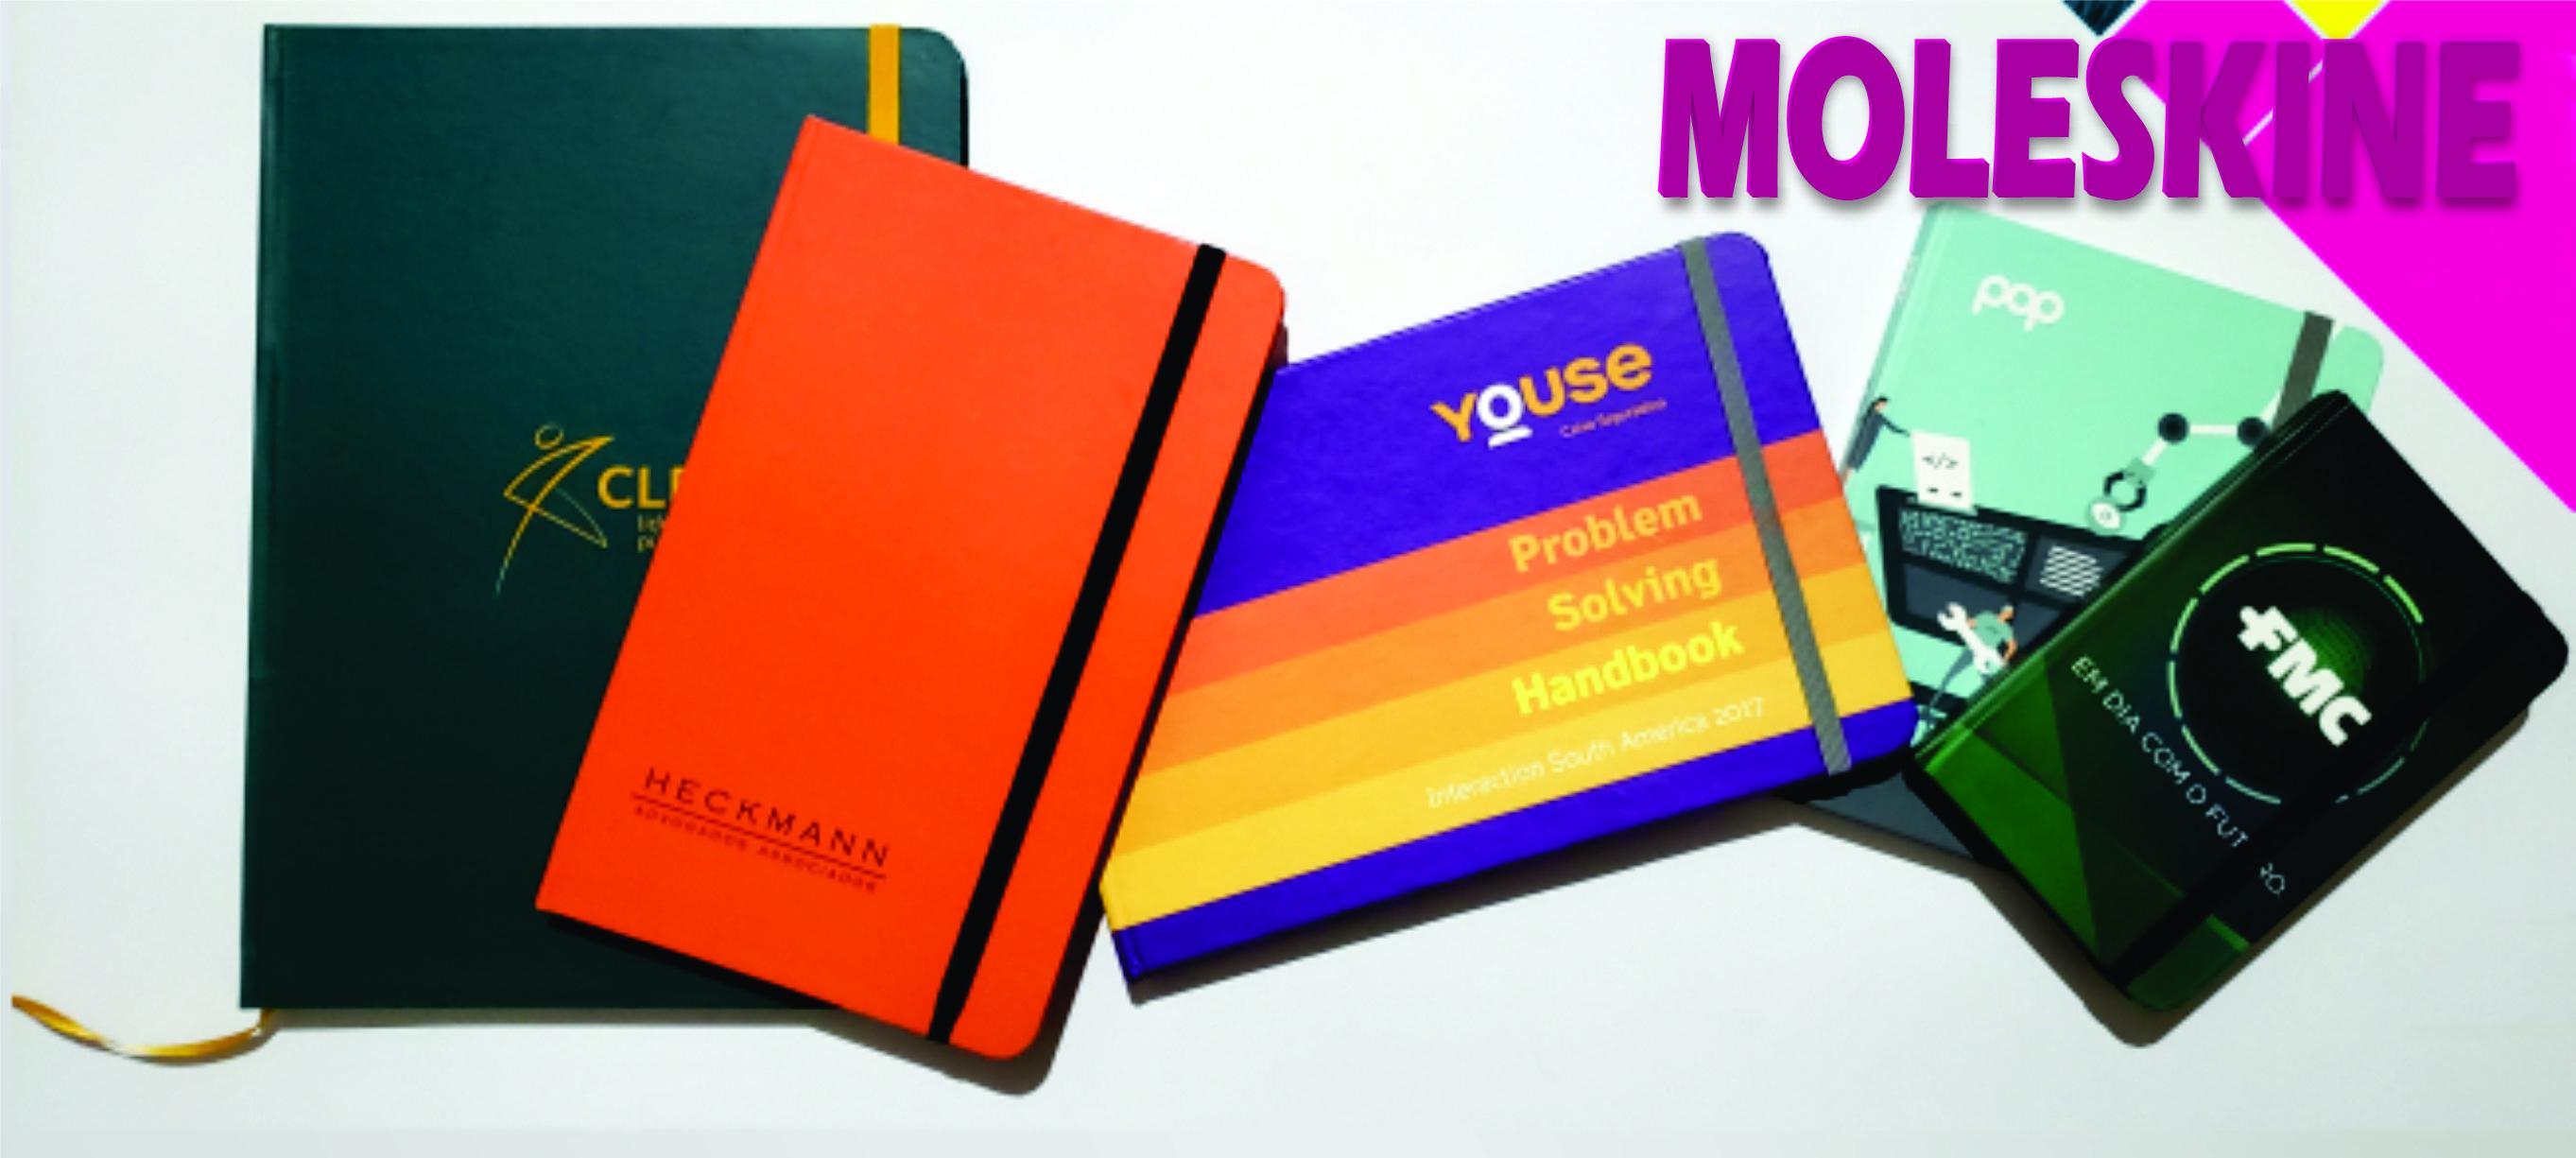 o Cadernos tipo moleskine